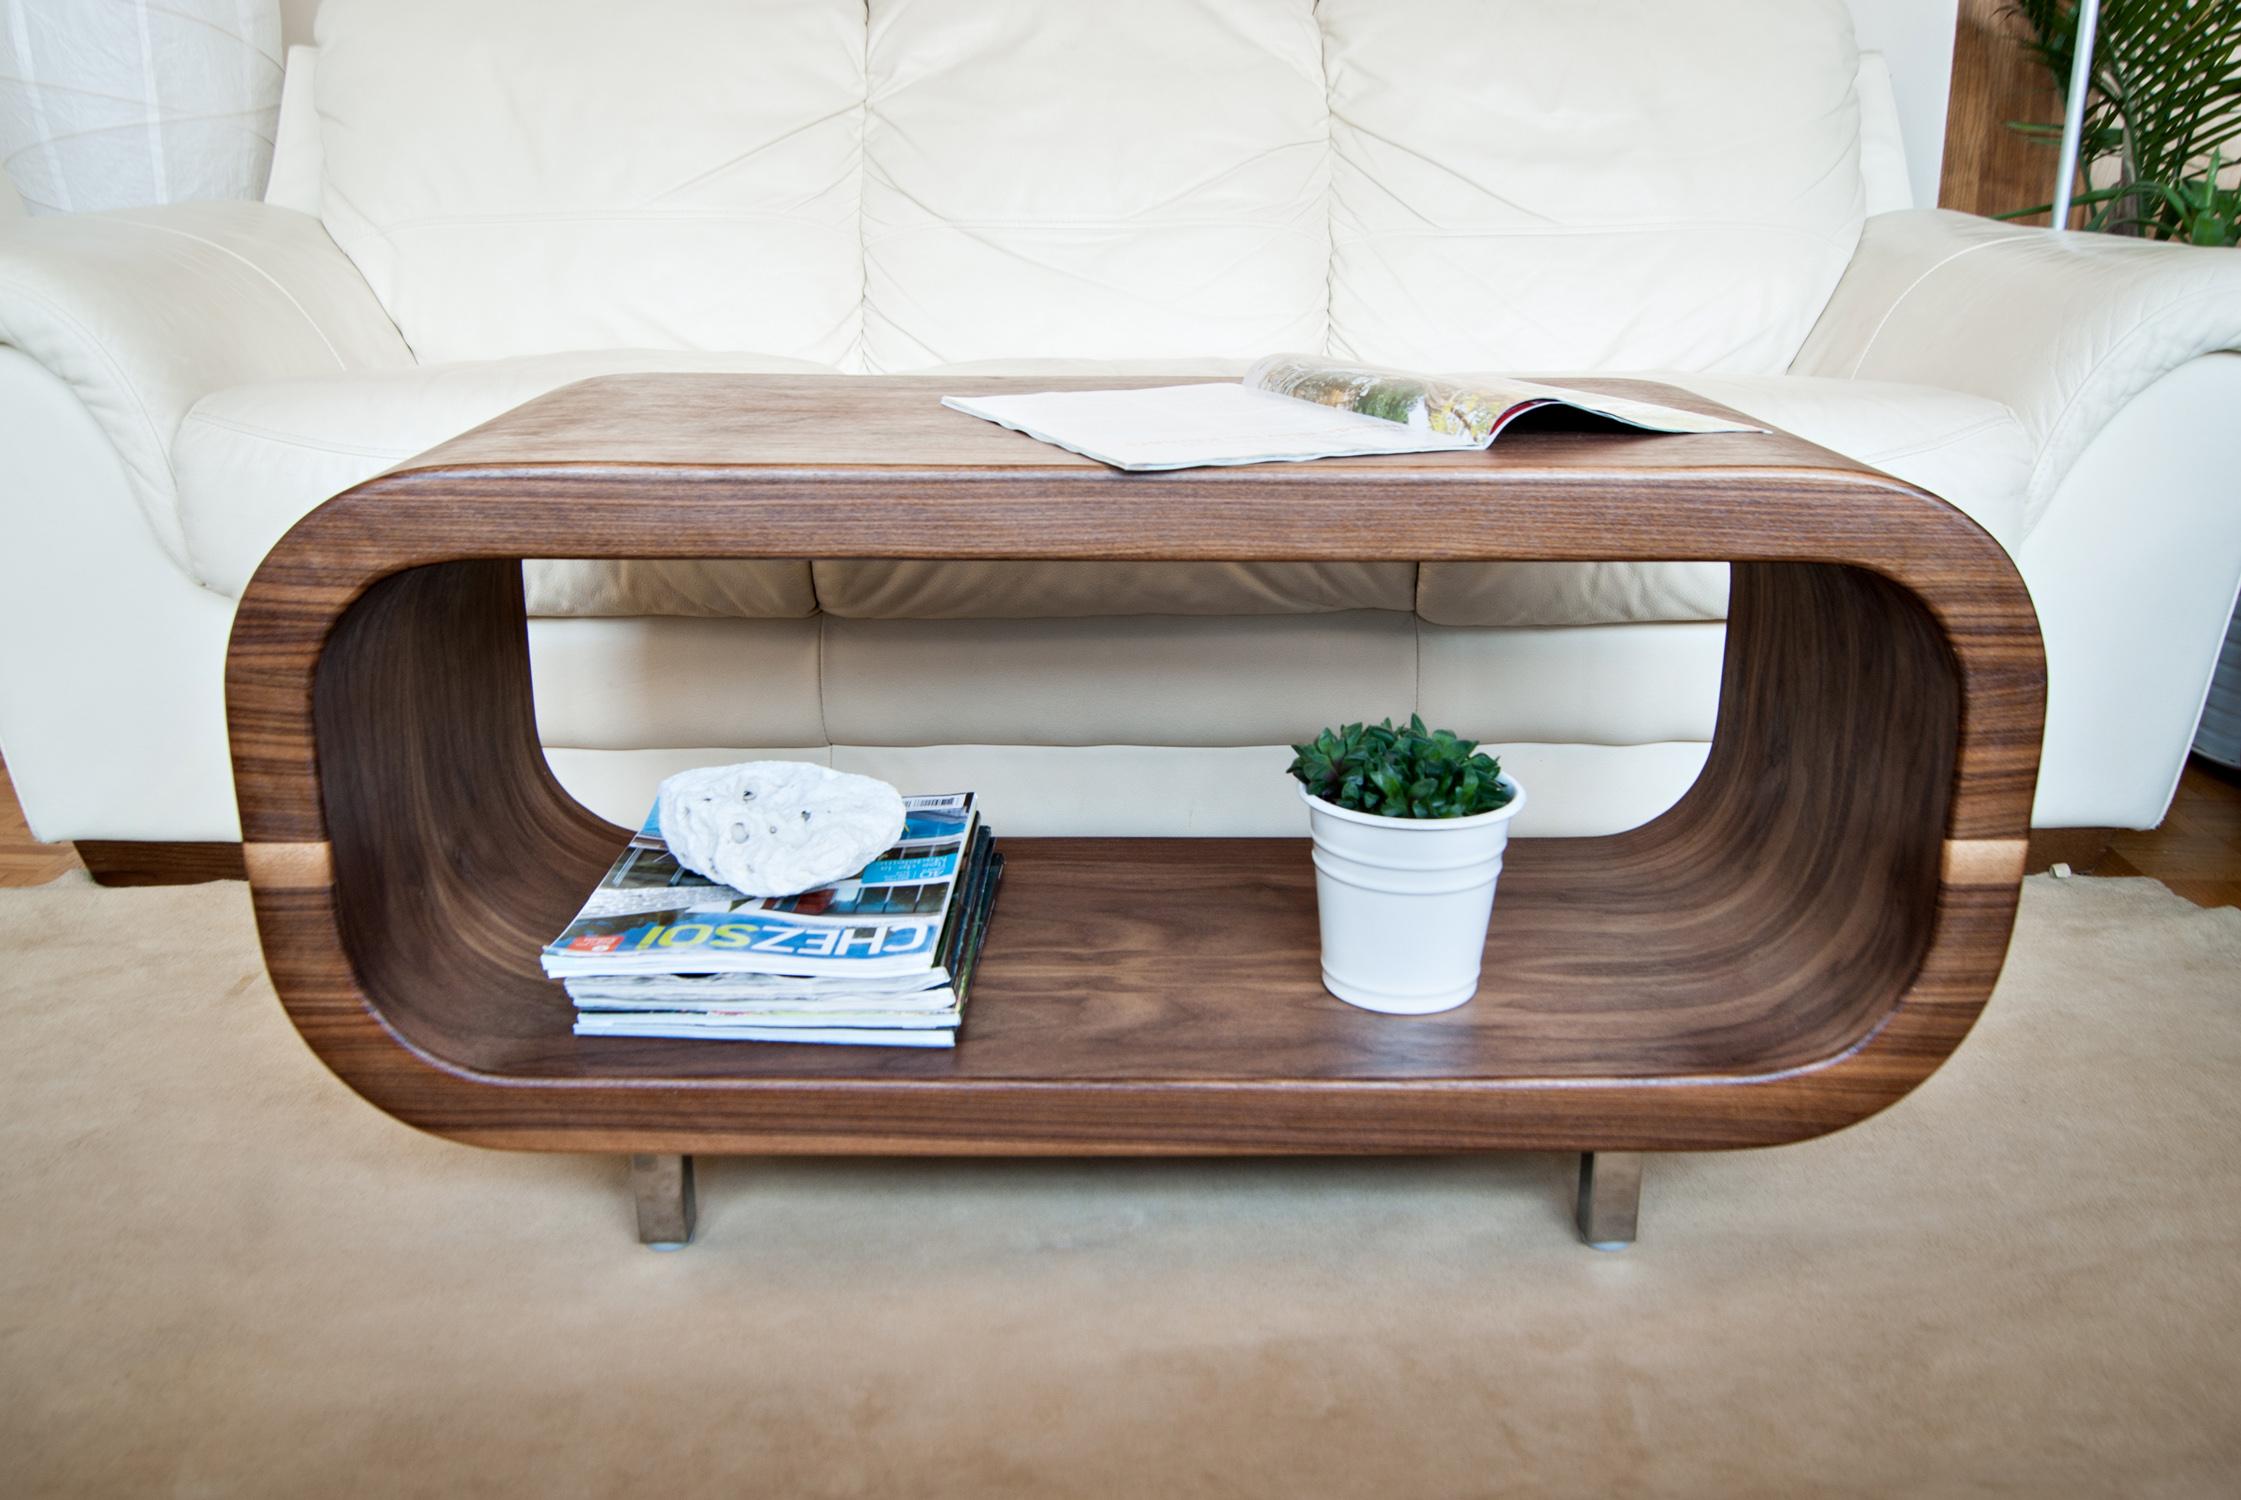 KRÖMM Design: Custom, Handmade Wood Furniture  – montrealgazette.com, July 7, 2014